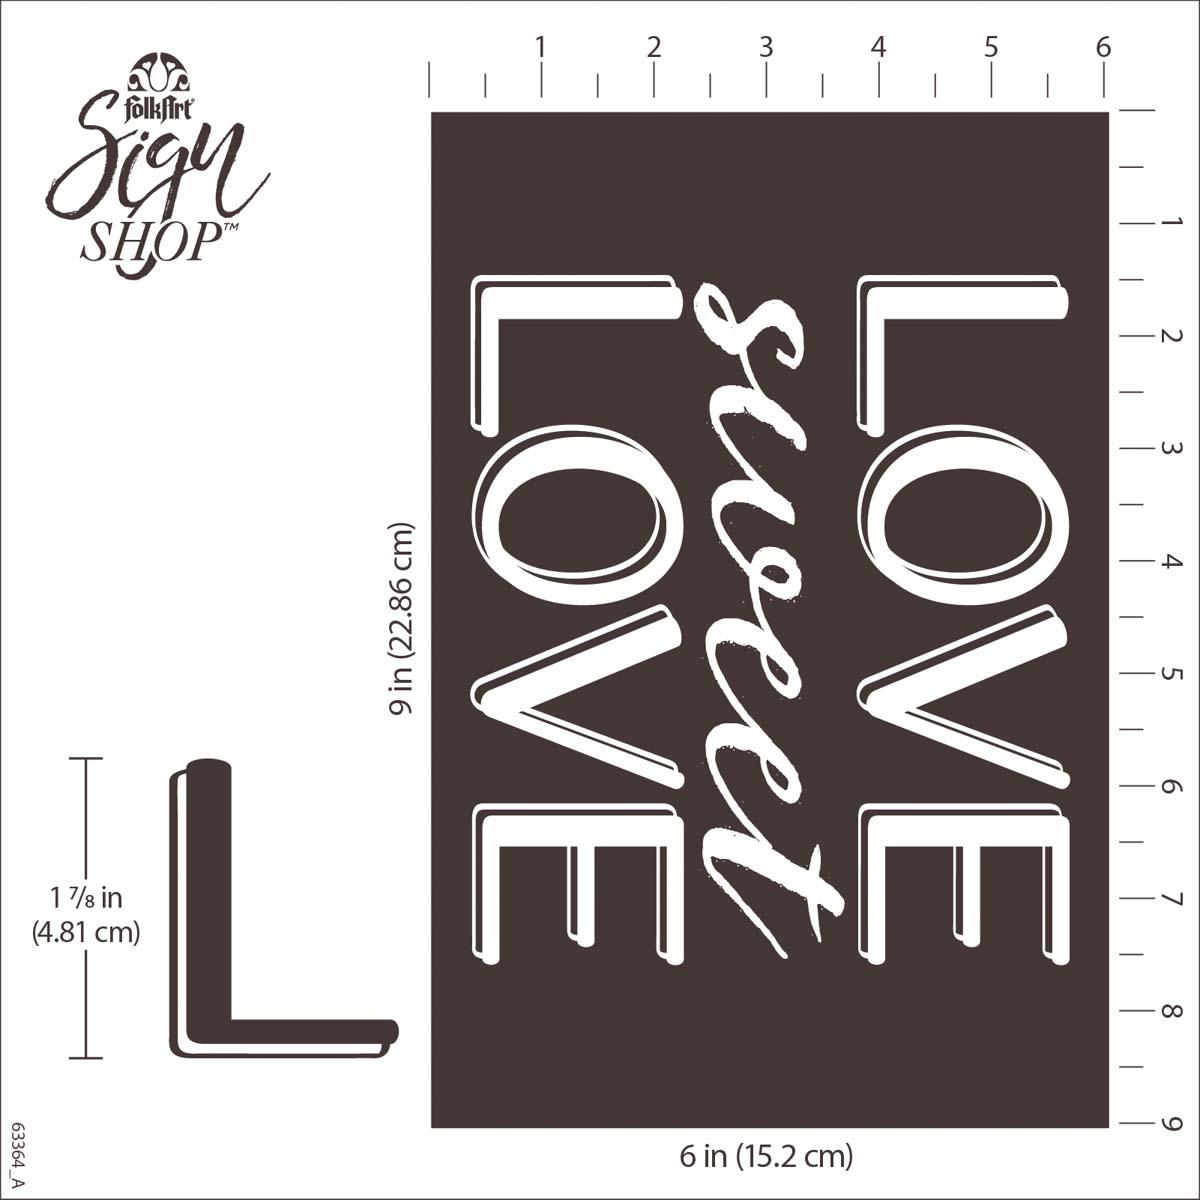 FolkArt ® Sign Shop™ Mesh Stencil - Sweet Love, 2 pc. - 63364